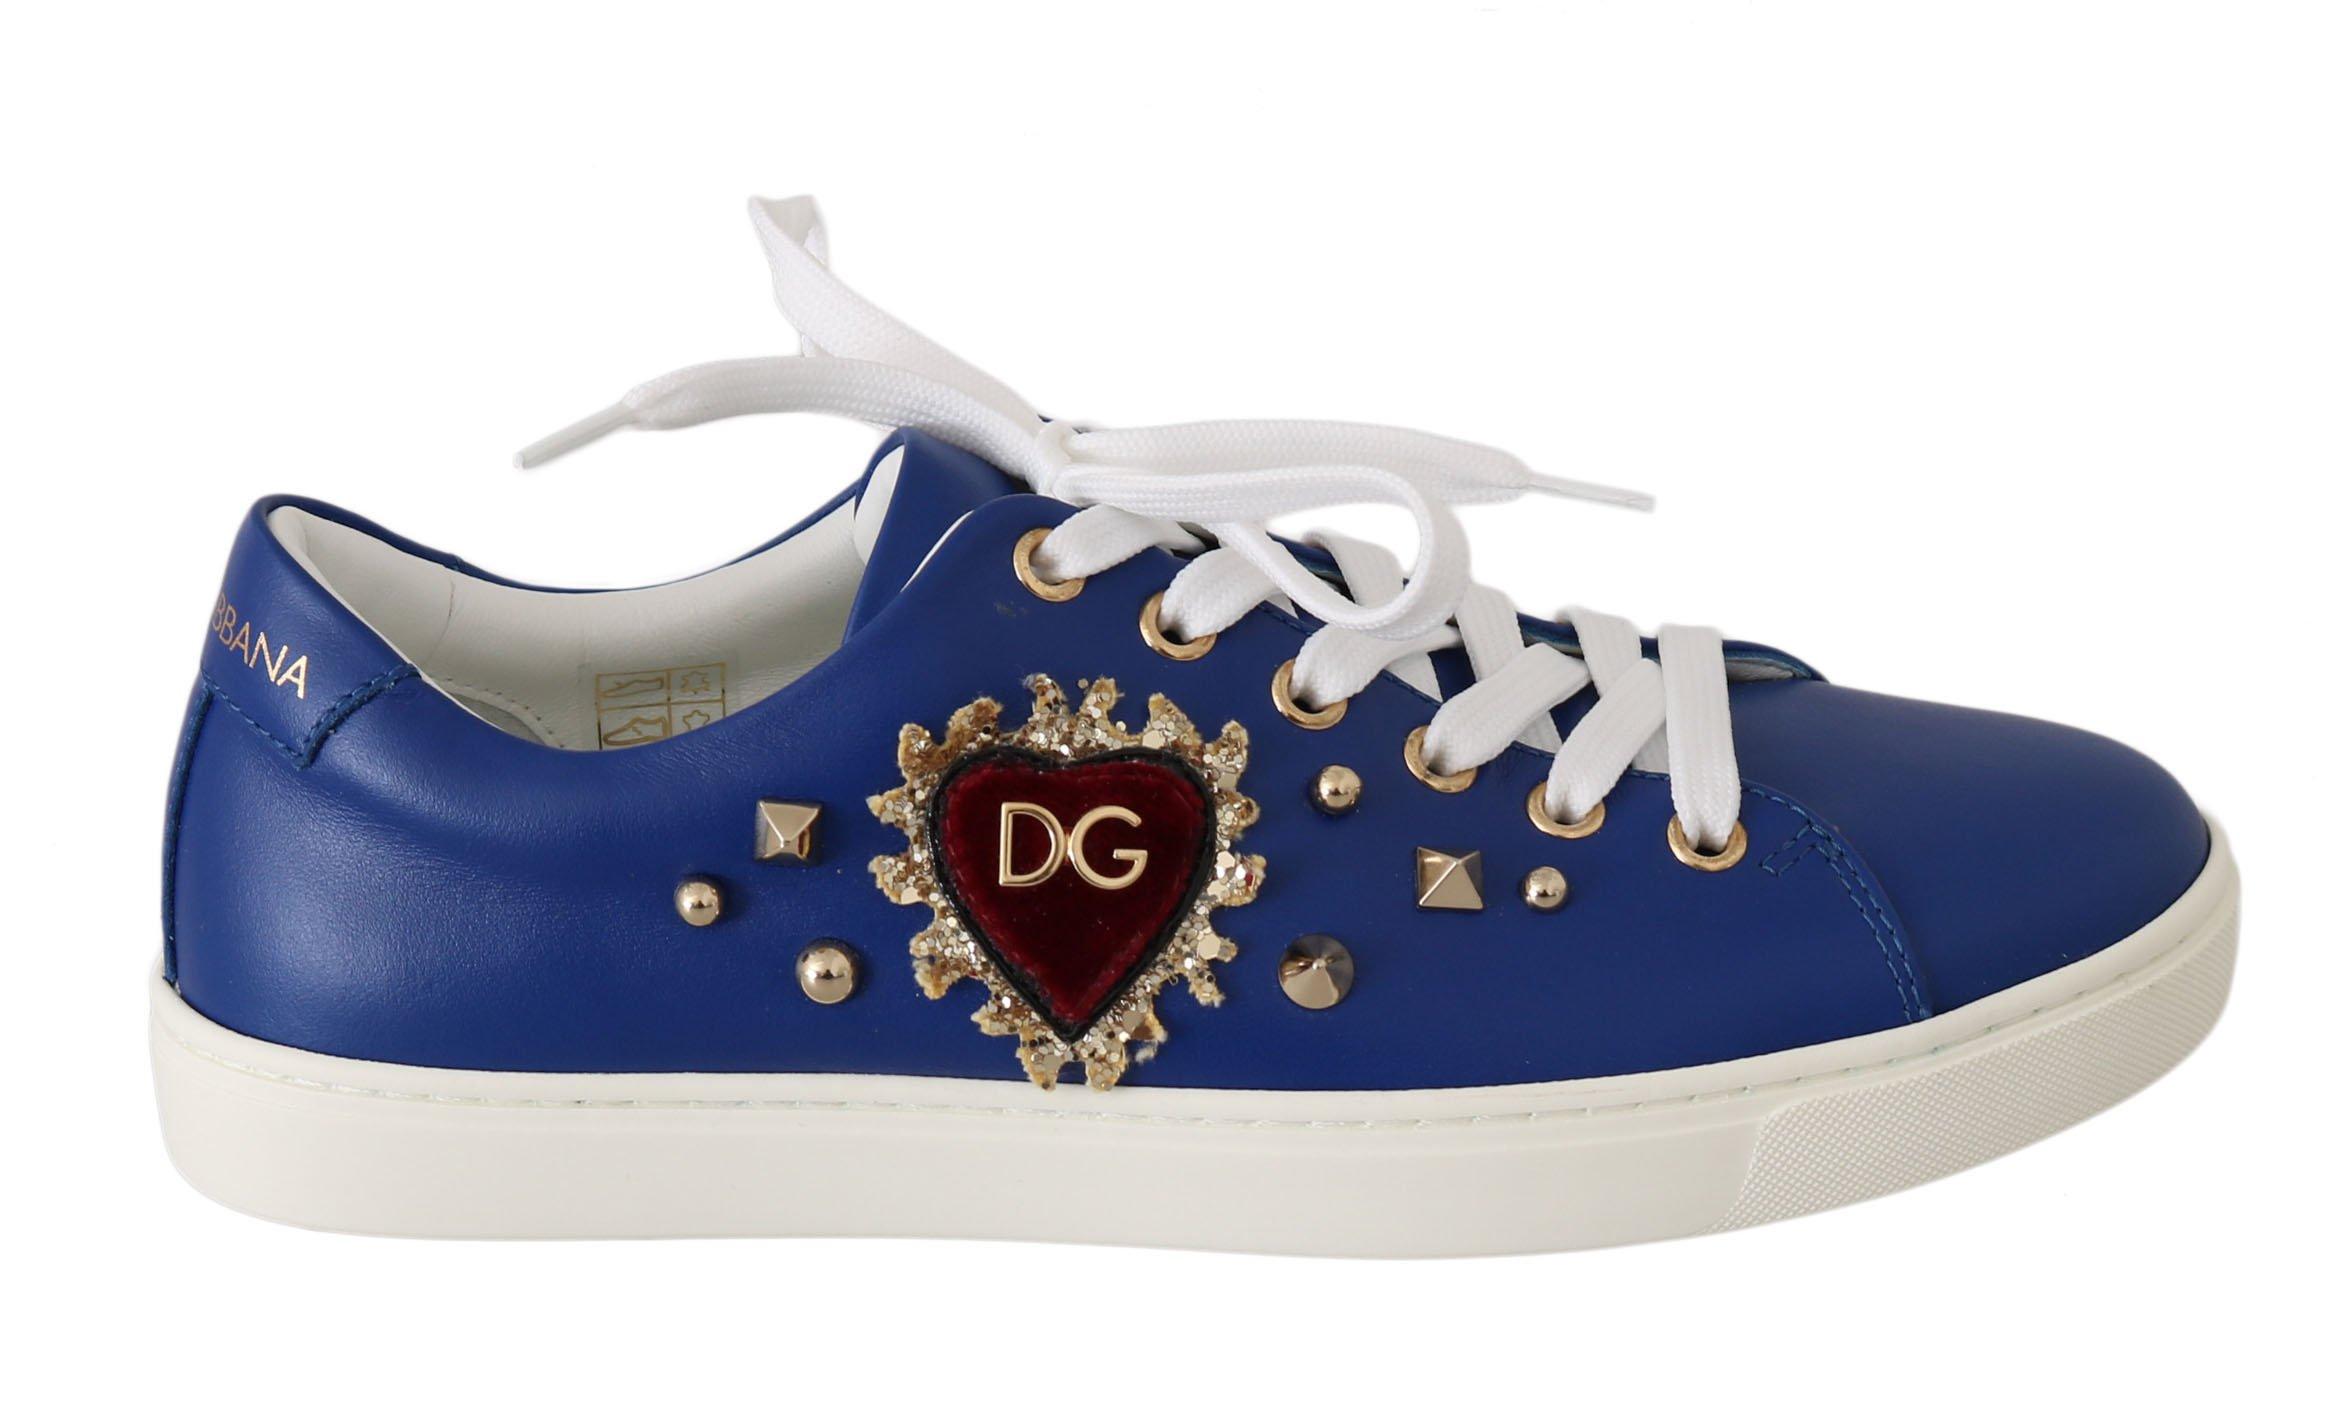 Dolce & Gabbana Women's Shoes Blue LA5976 - EU35/US4.5